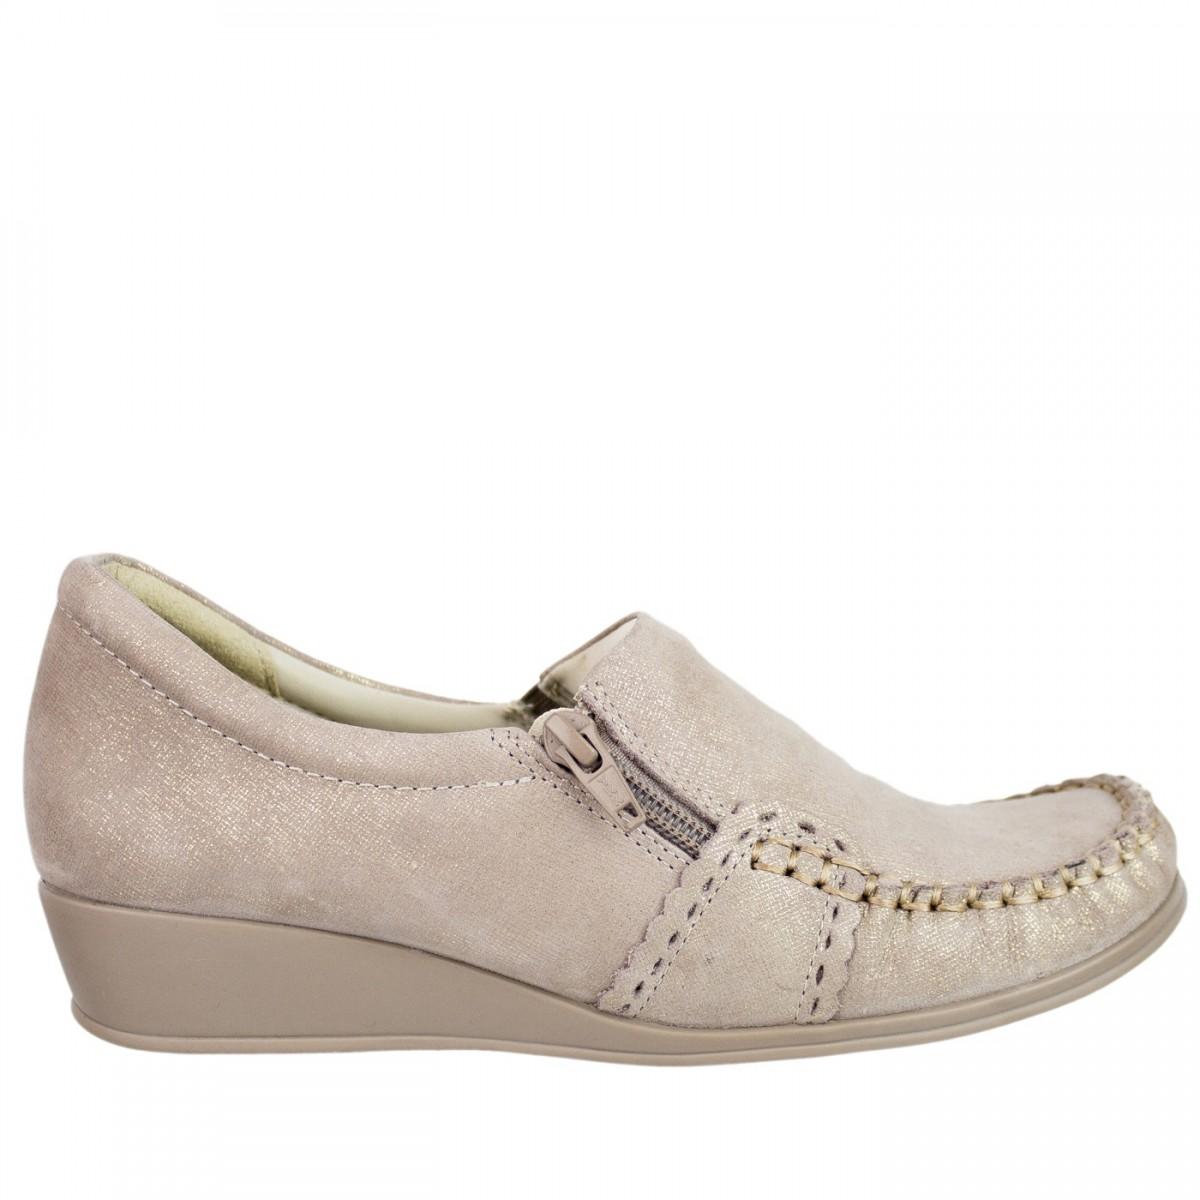 35762a2aac Bizz Store - Mocassim Feminino Comfortflex Salto Anabela Bege